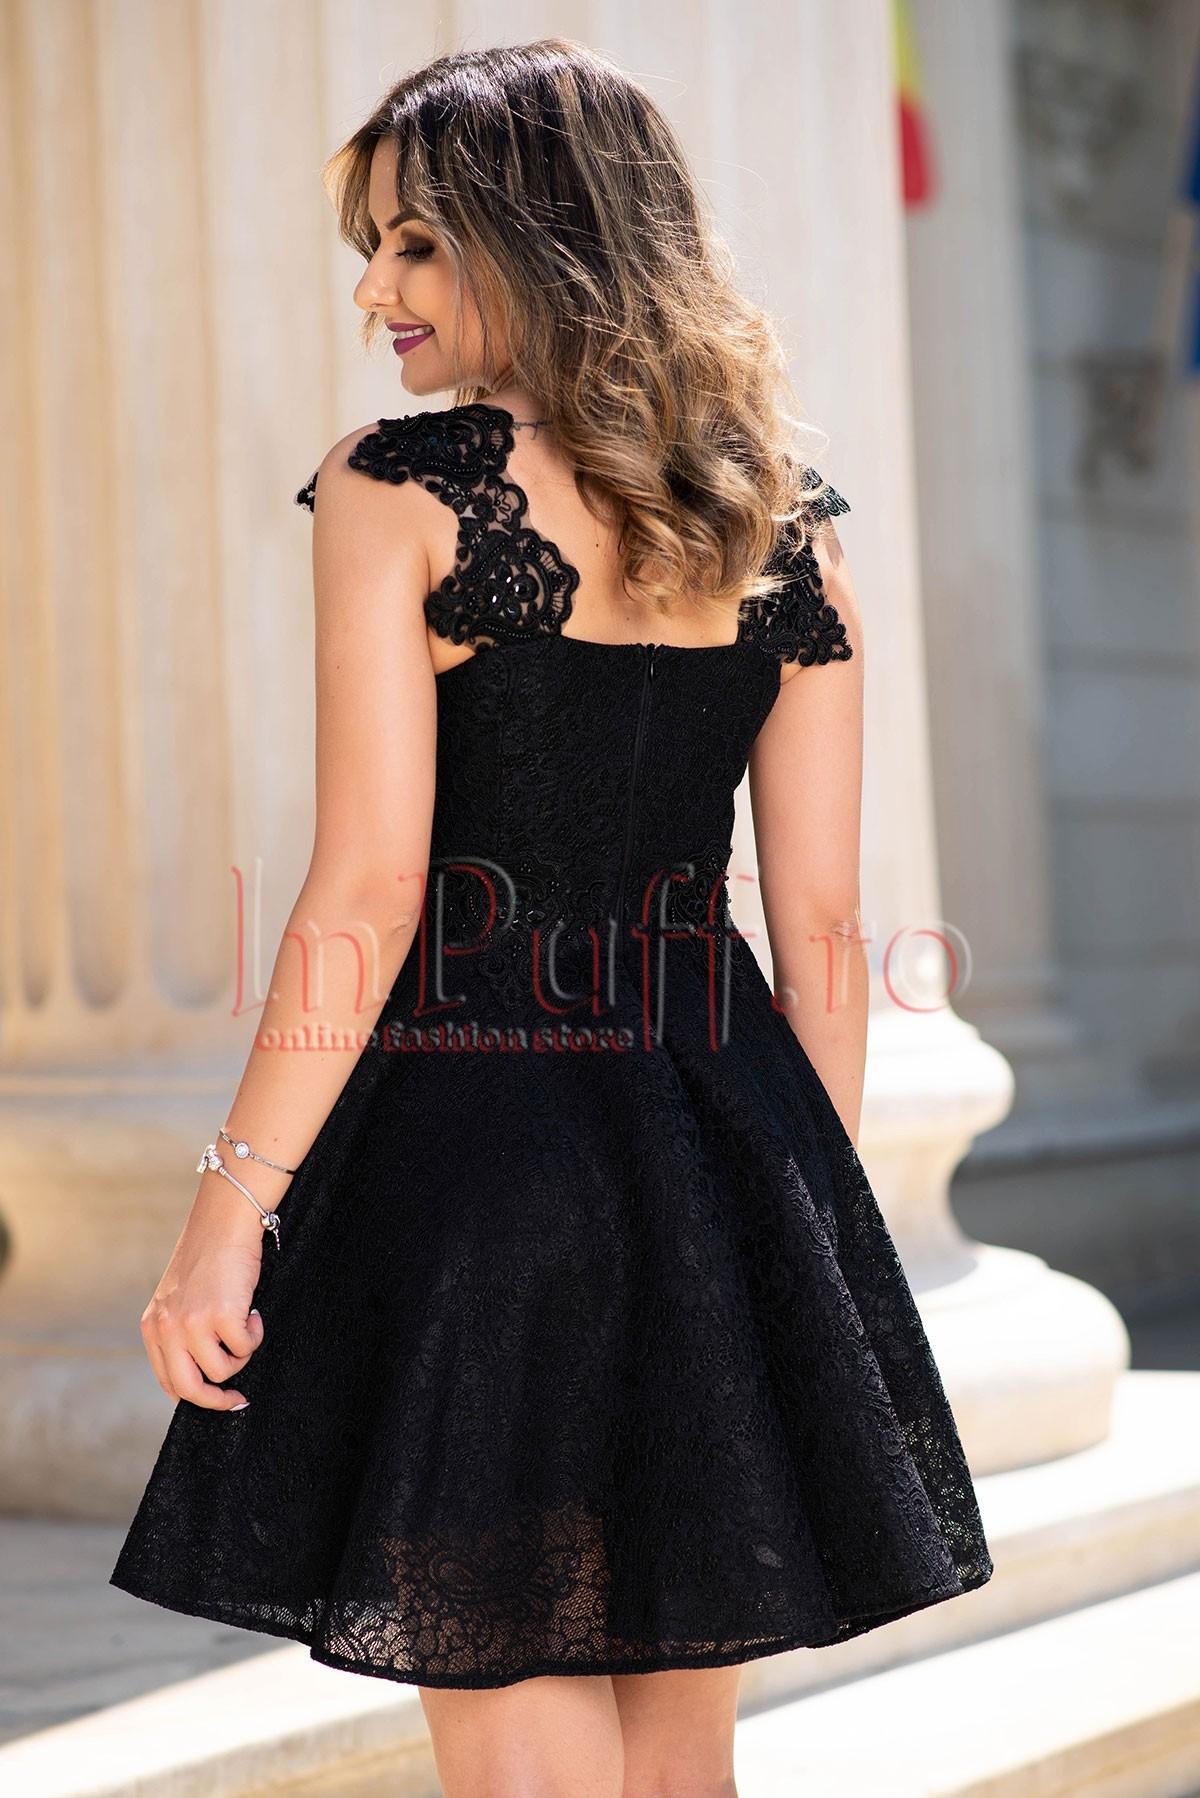 Rochie de seara cu broderie neagra accesorizata cu pietricele